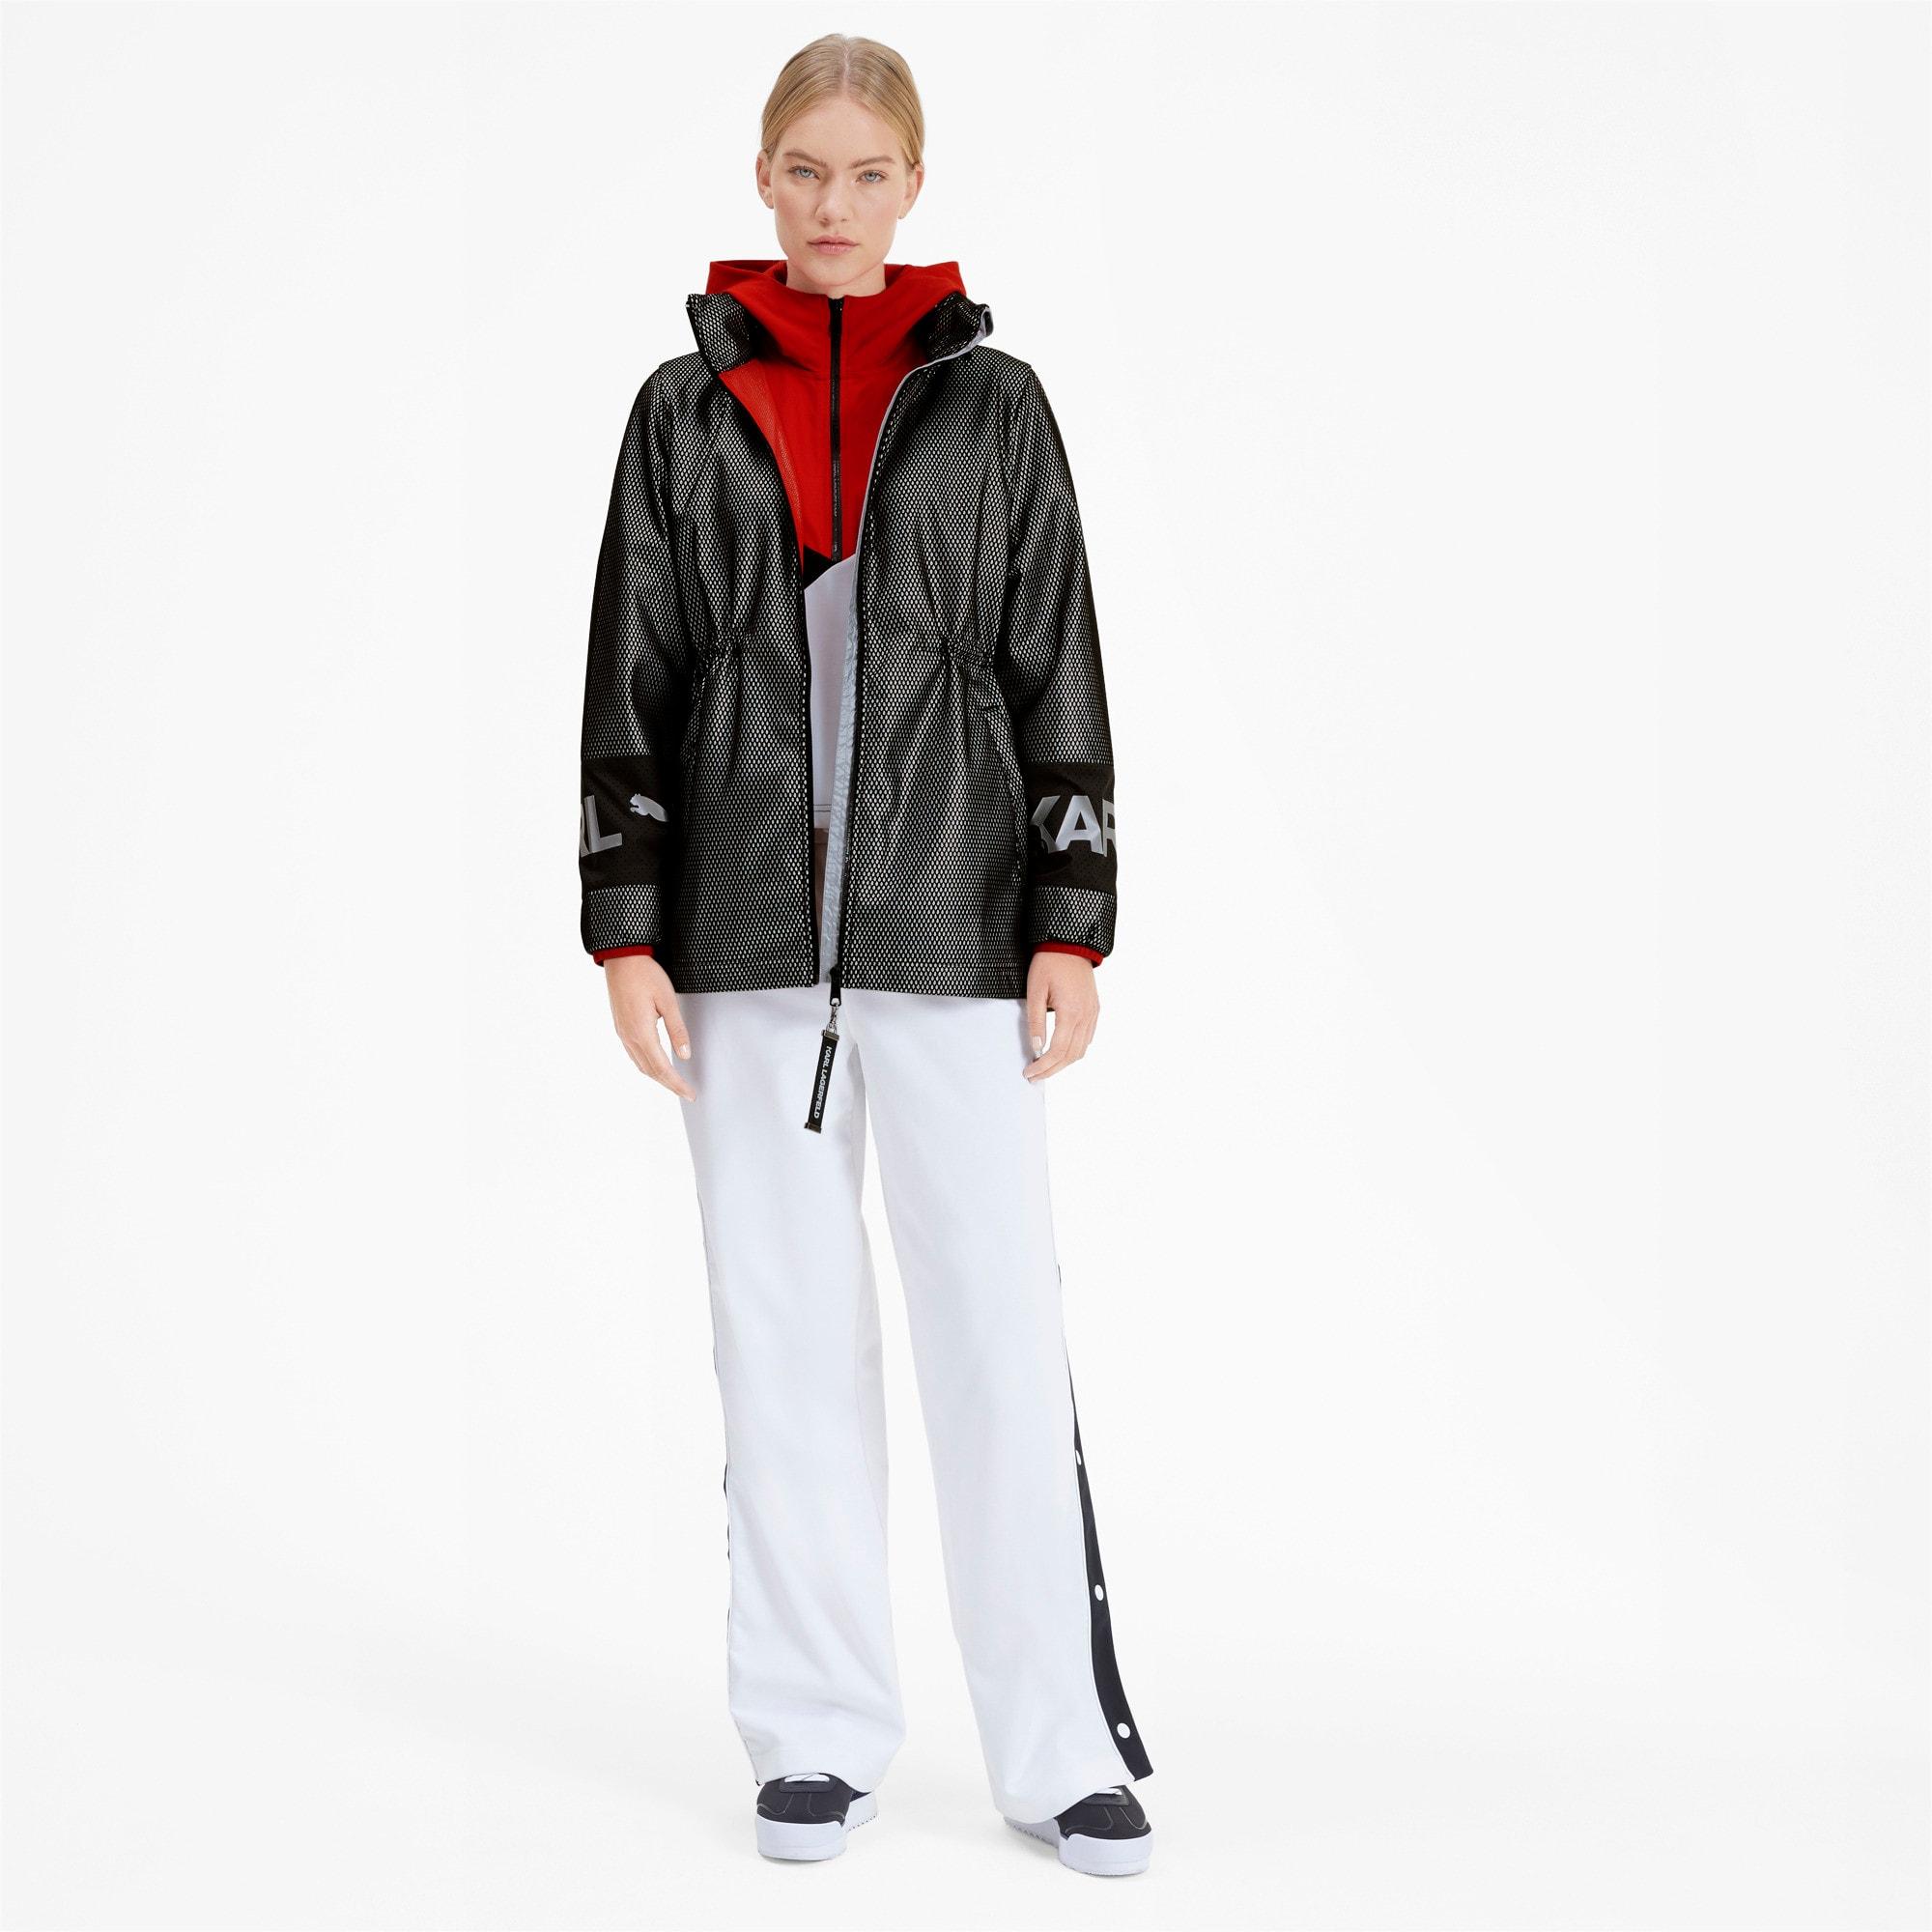 Thumbnail 3 of PUMA x KARL LAGERFELD Women's Outerwear Jacket, Puma Black, medium